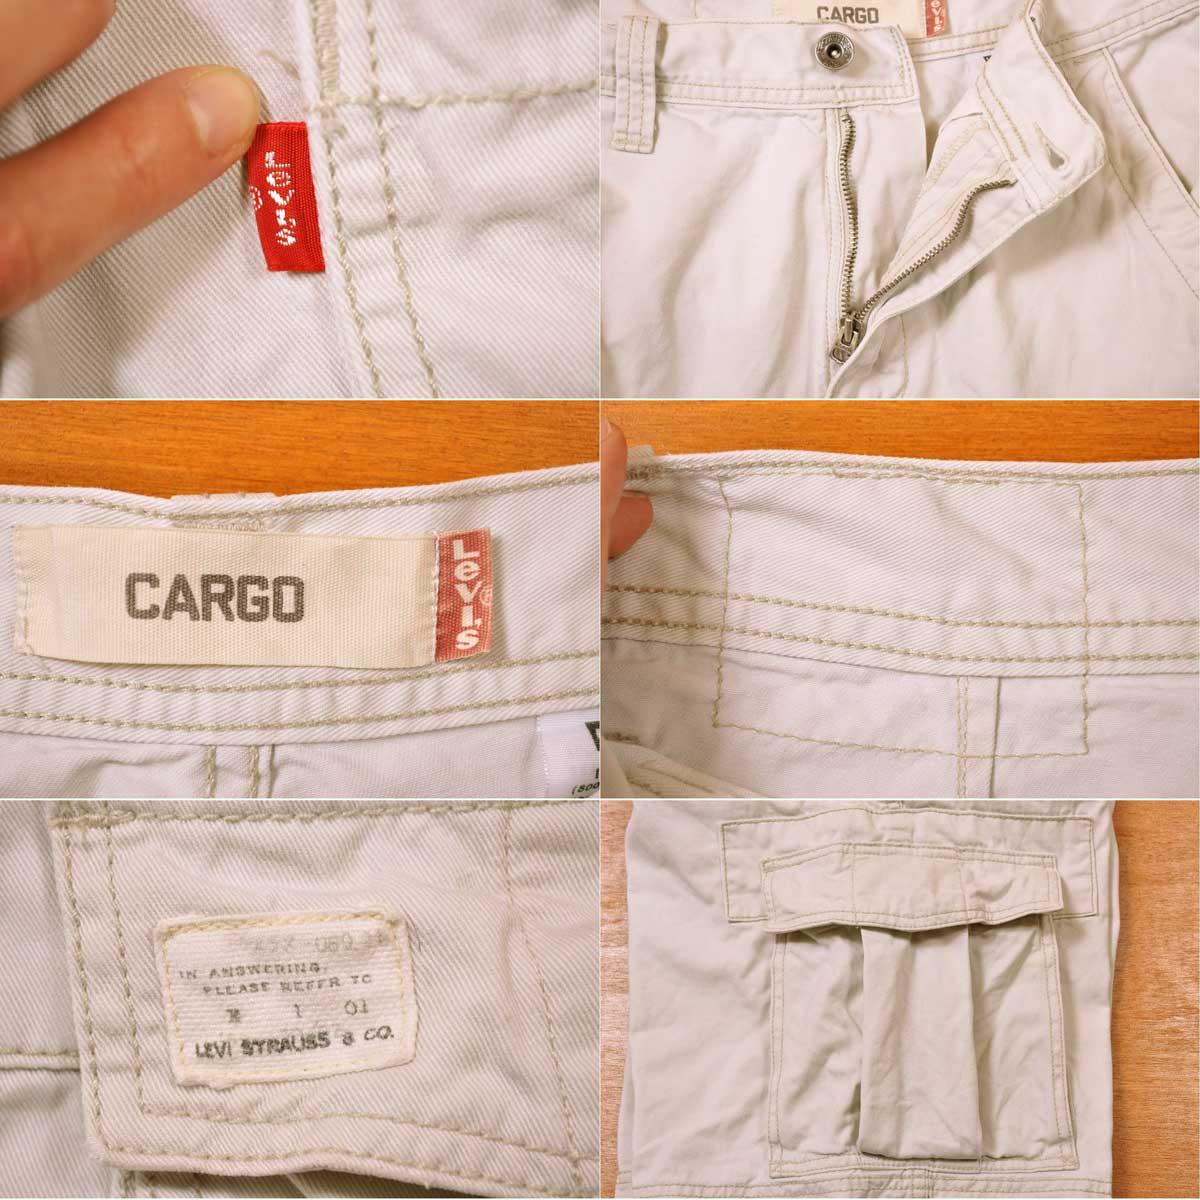 da0d34c6 ... Levi's Levis 6 pocket half underwear cargo shorts off-white system W30  equivalency▽